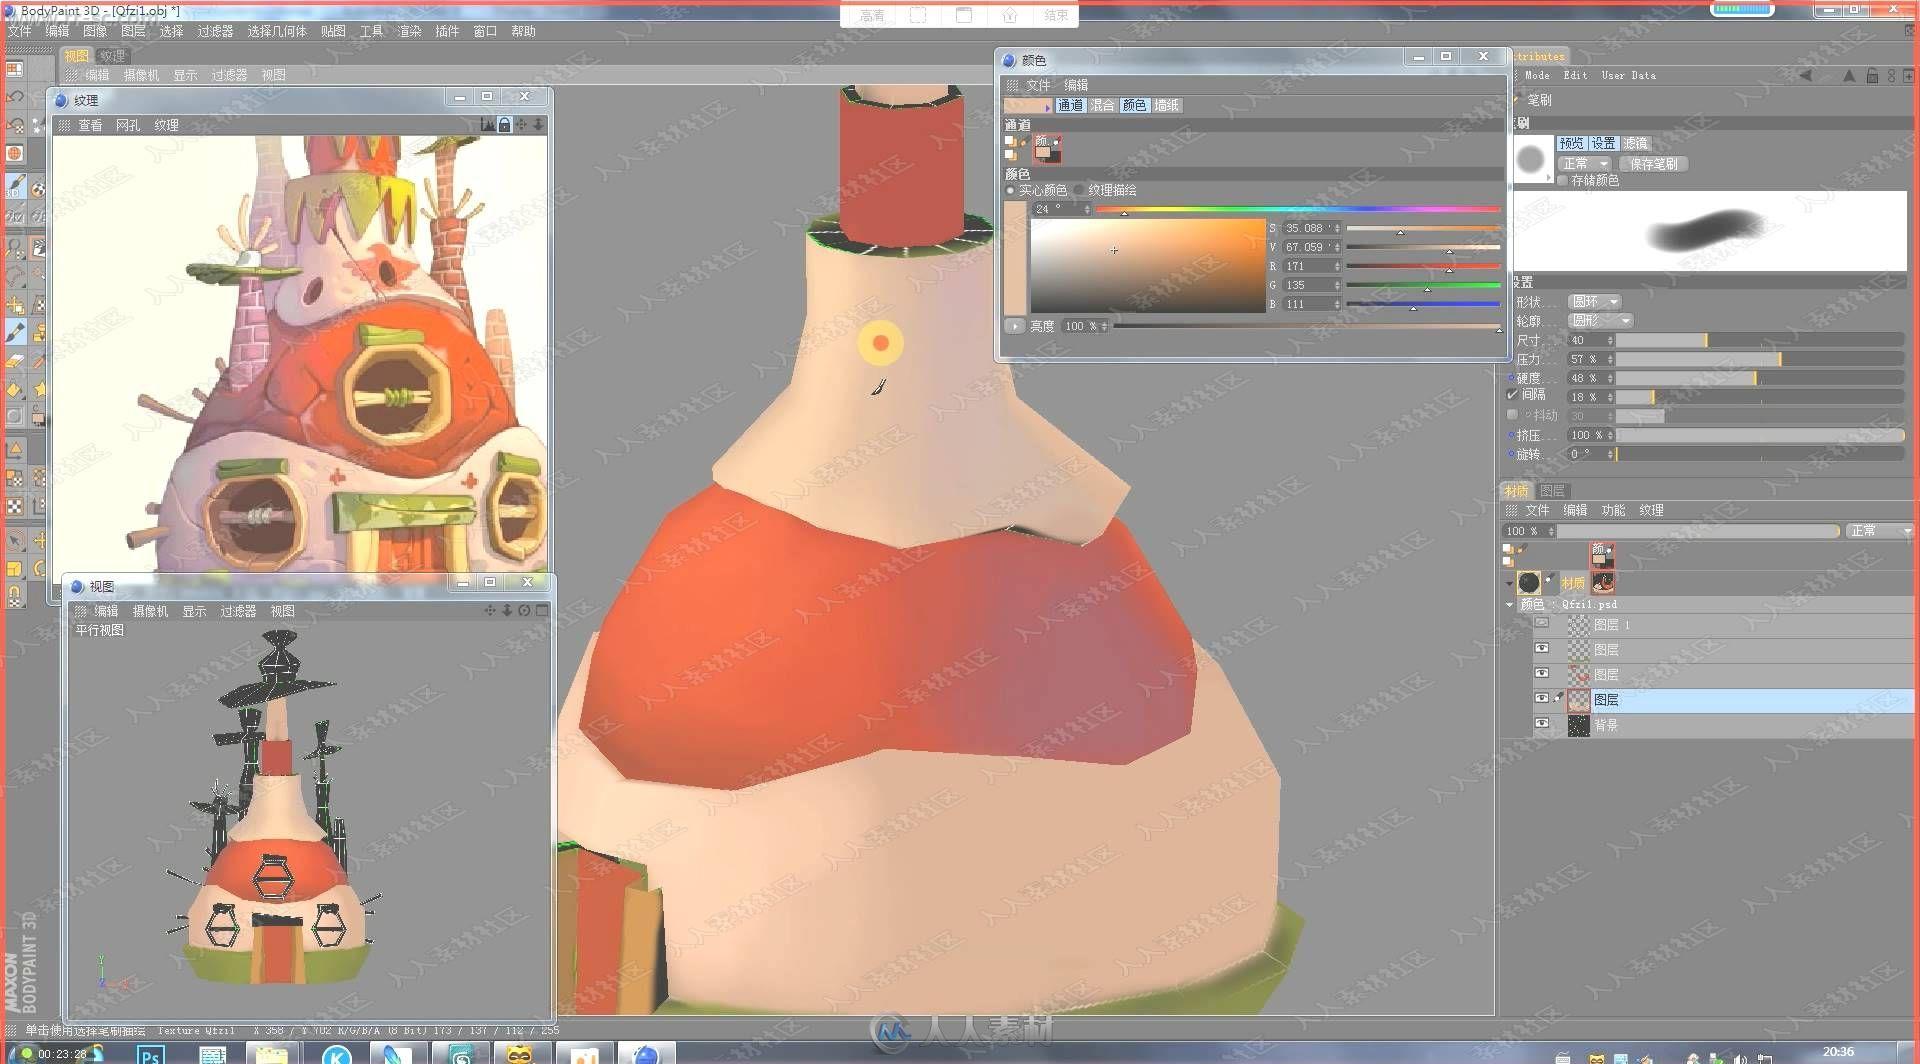 Bodypaint3D绘制Q版小房子贴图视频教程